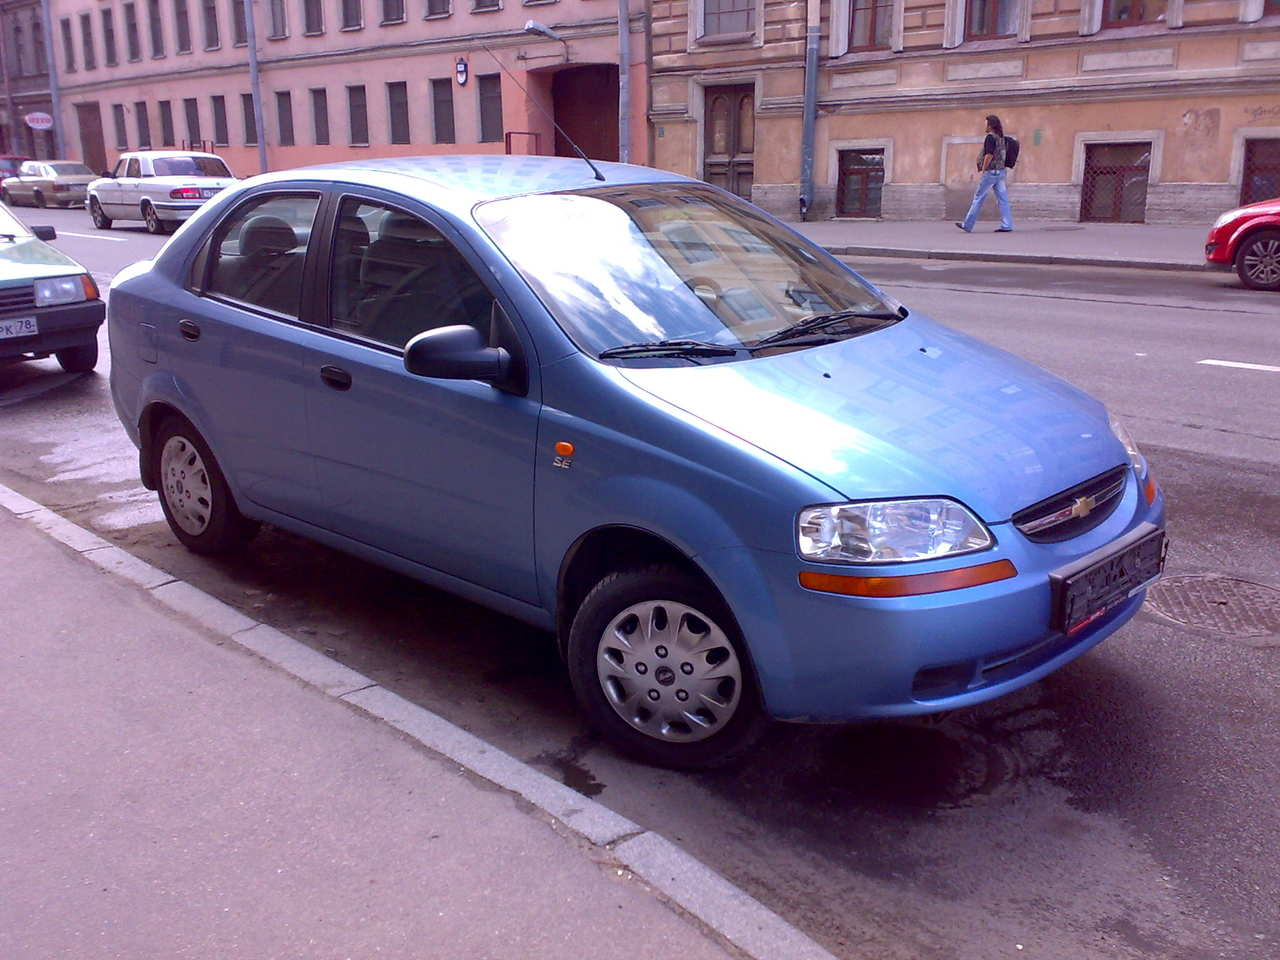 2004 chevrolet aveo photos  1 4  gasoline  ff  manual for sale 2012 Aveo Car 2008 Aveo Car